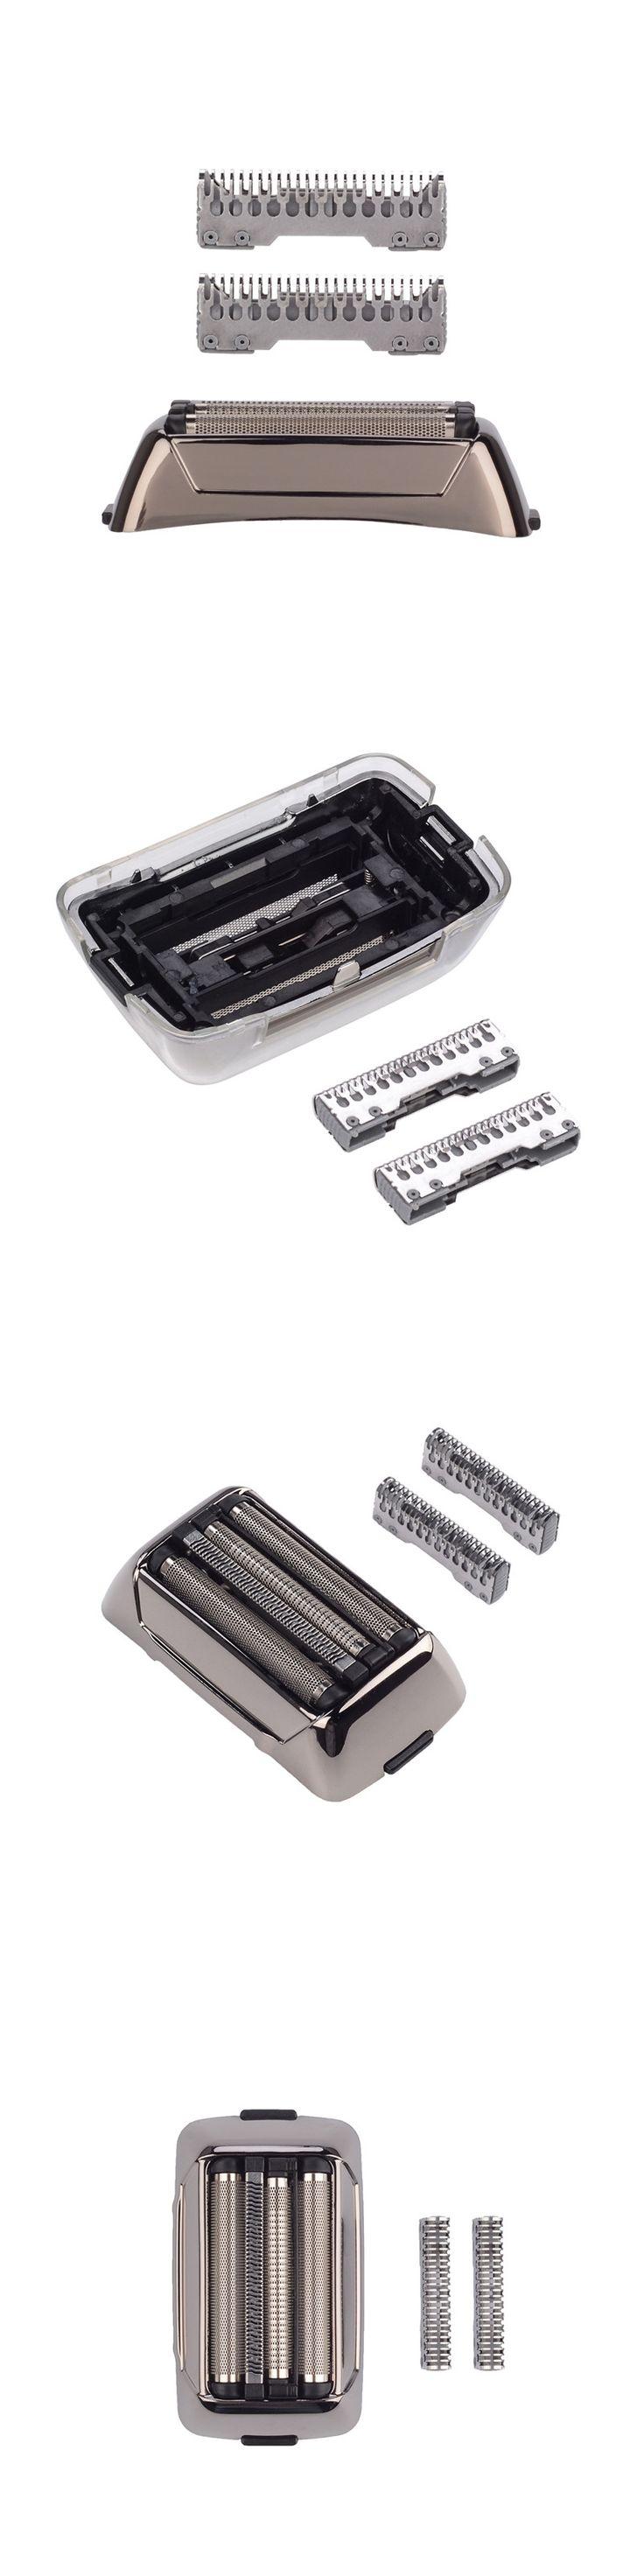 Kemei KM-5568 Shaver Blade Head Razor Blade Shaving Men Replacement Shaver Razor Head Reciprocating Electric Trimmer Blade